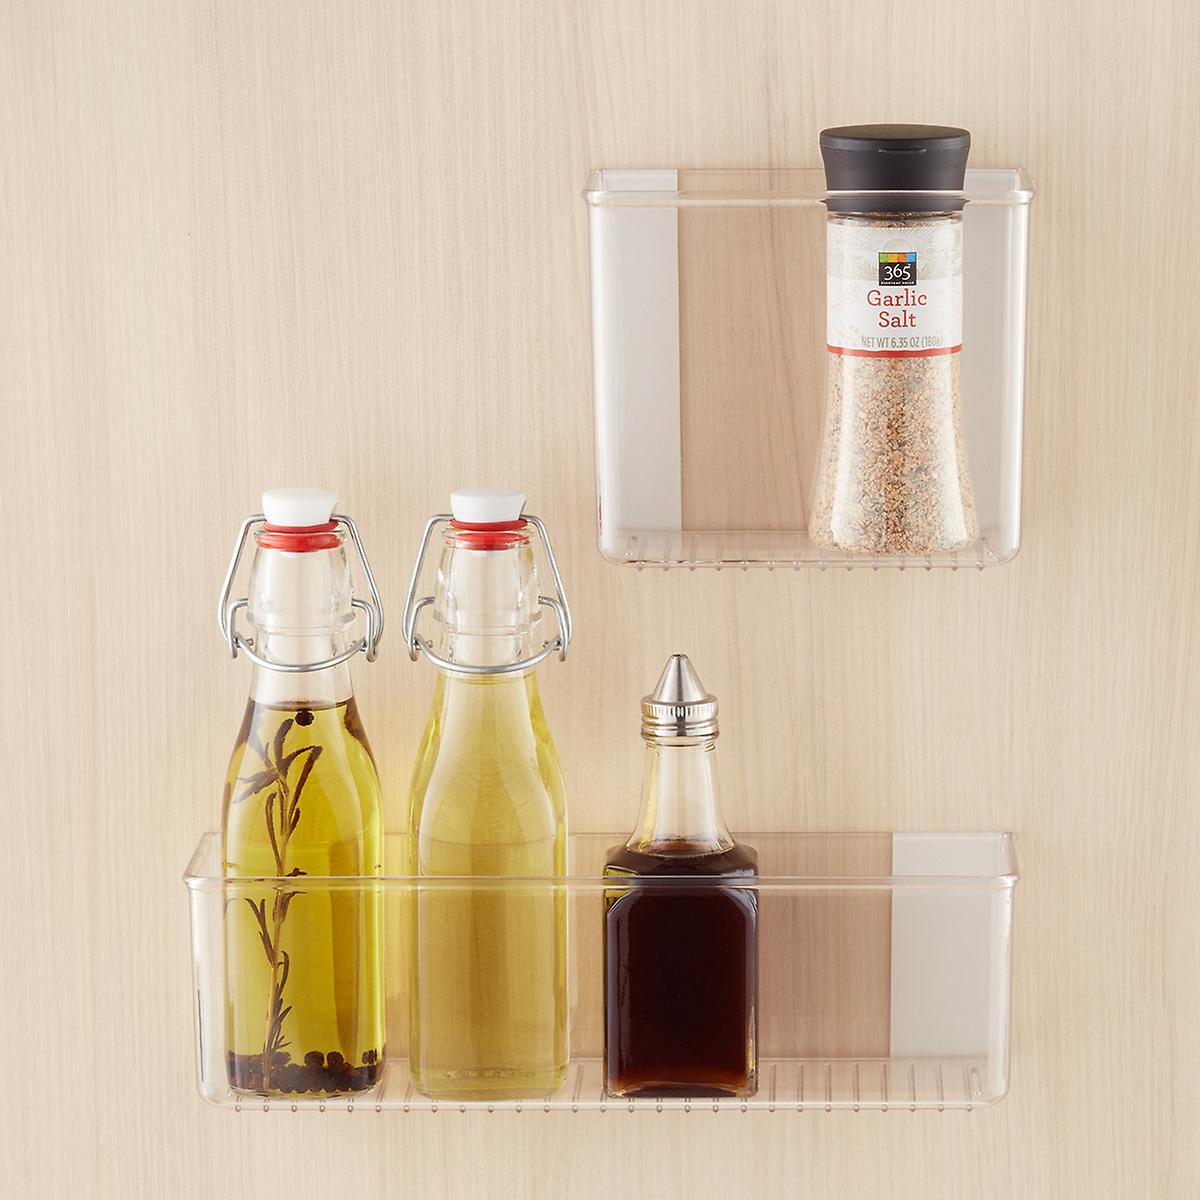 Interdesign Affixx Adhesive Organizer Bins The Container Store